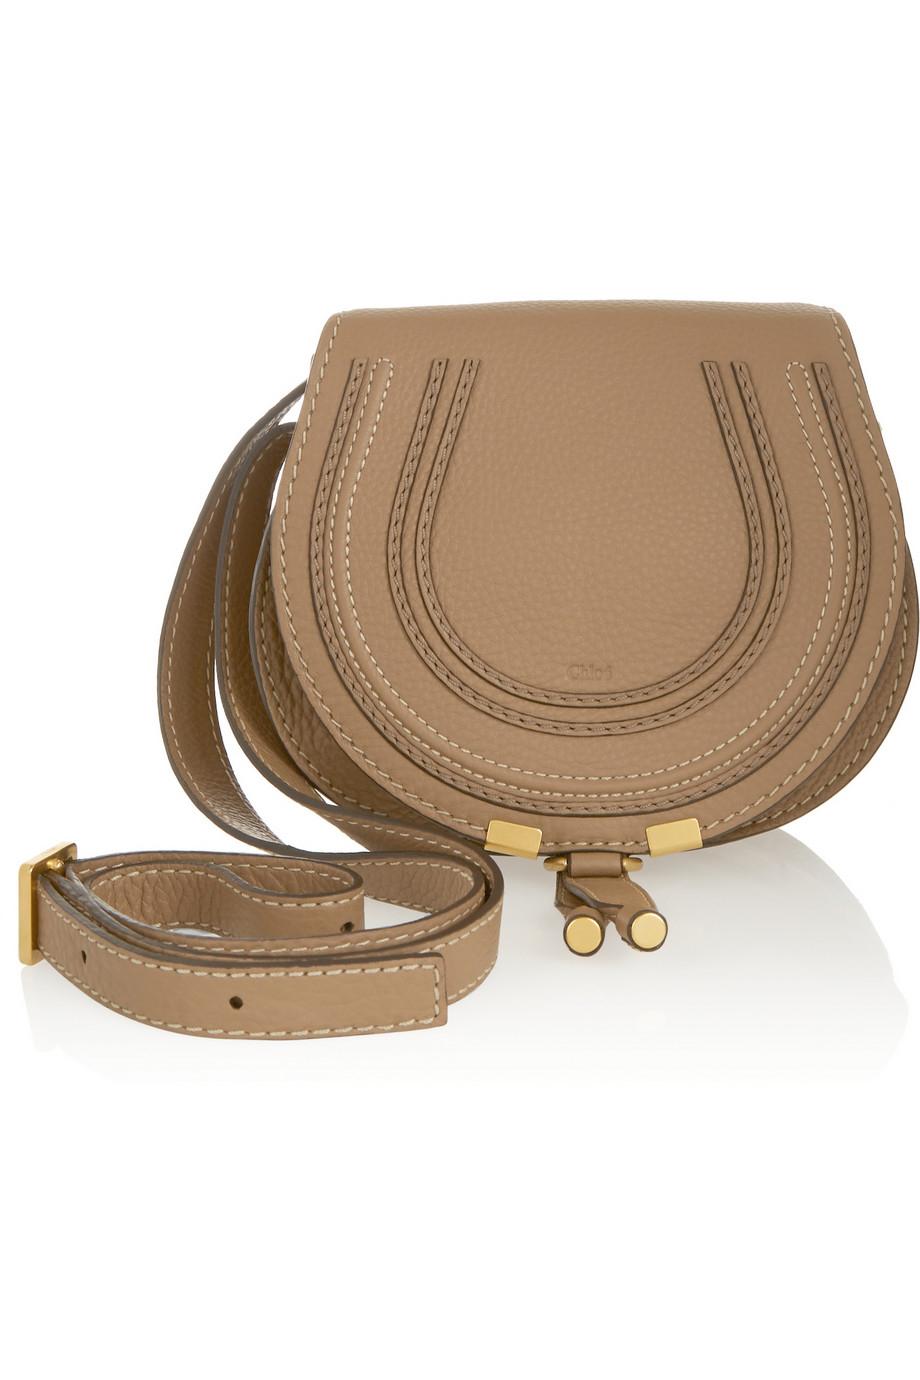 chlo the marcie mini textured leather shoulder bag in. Black Bedroom Furniture Sets. Home Design Ideas